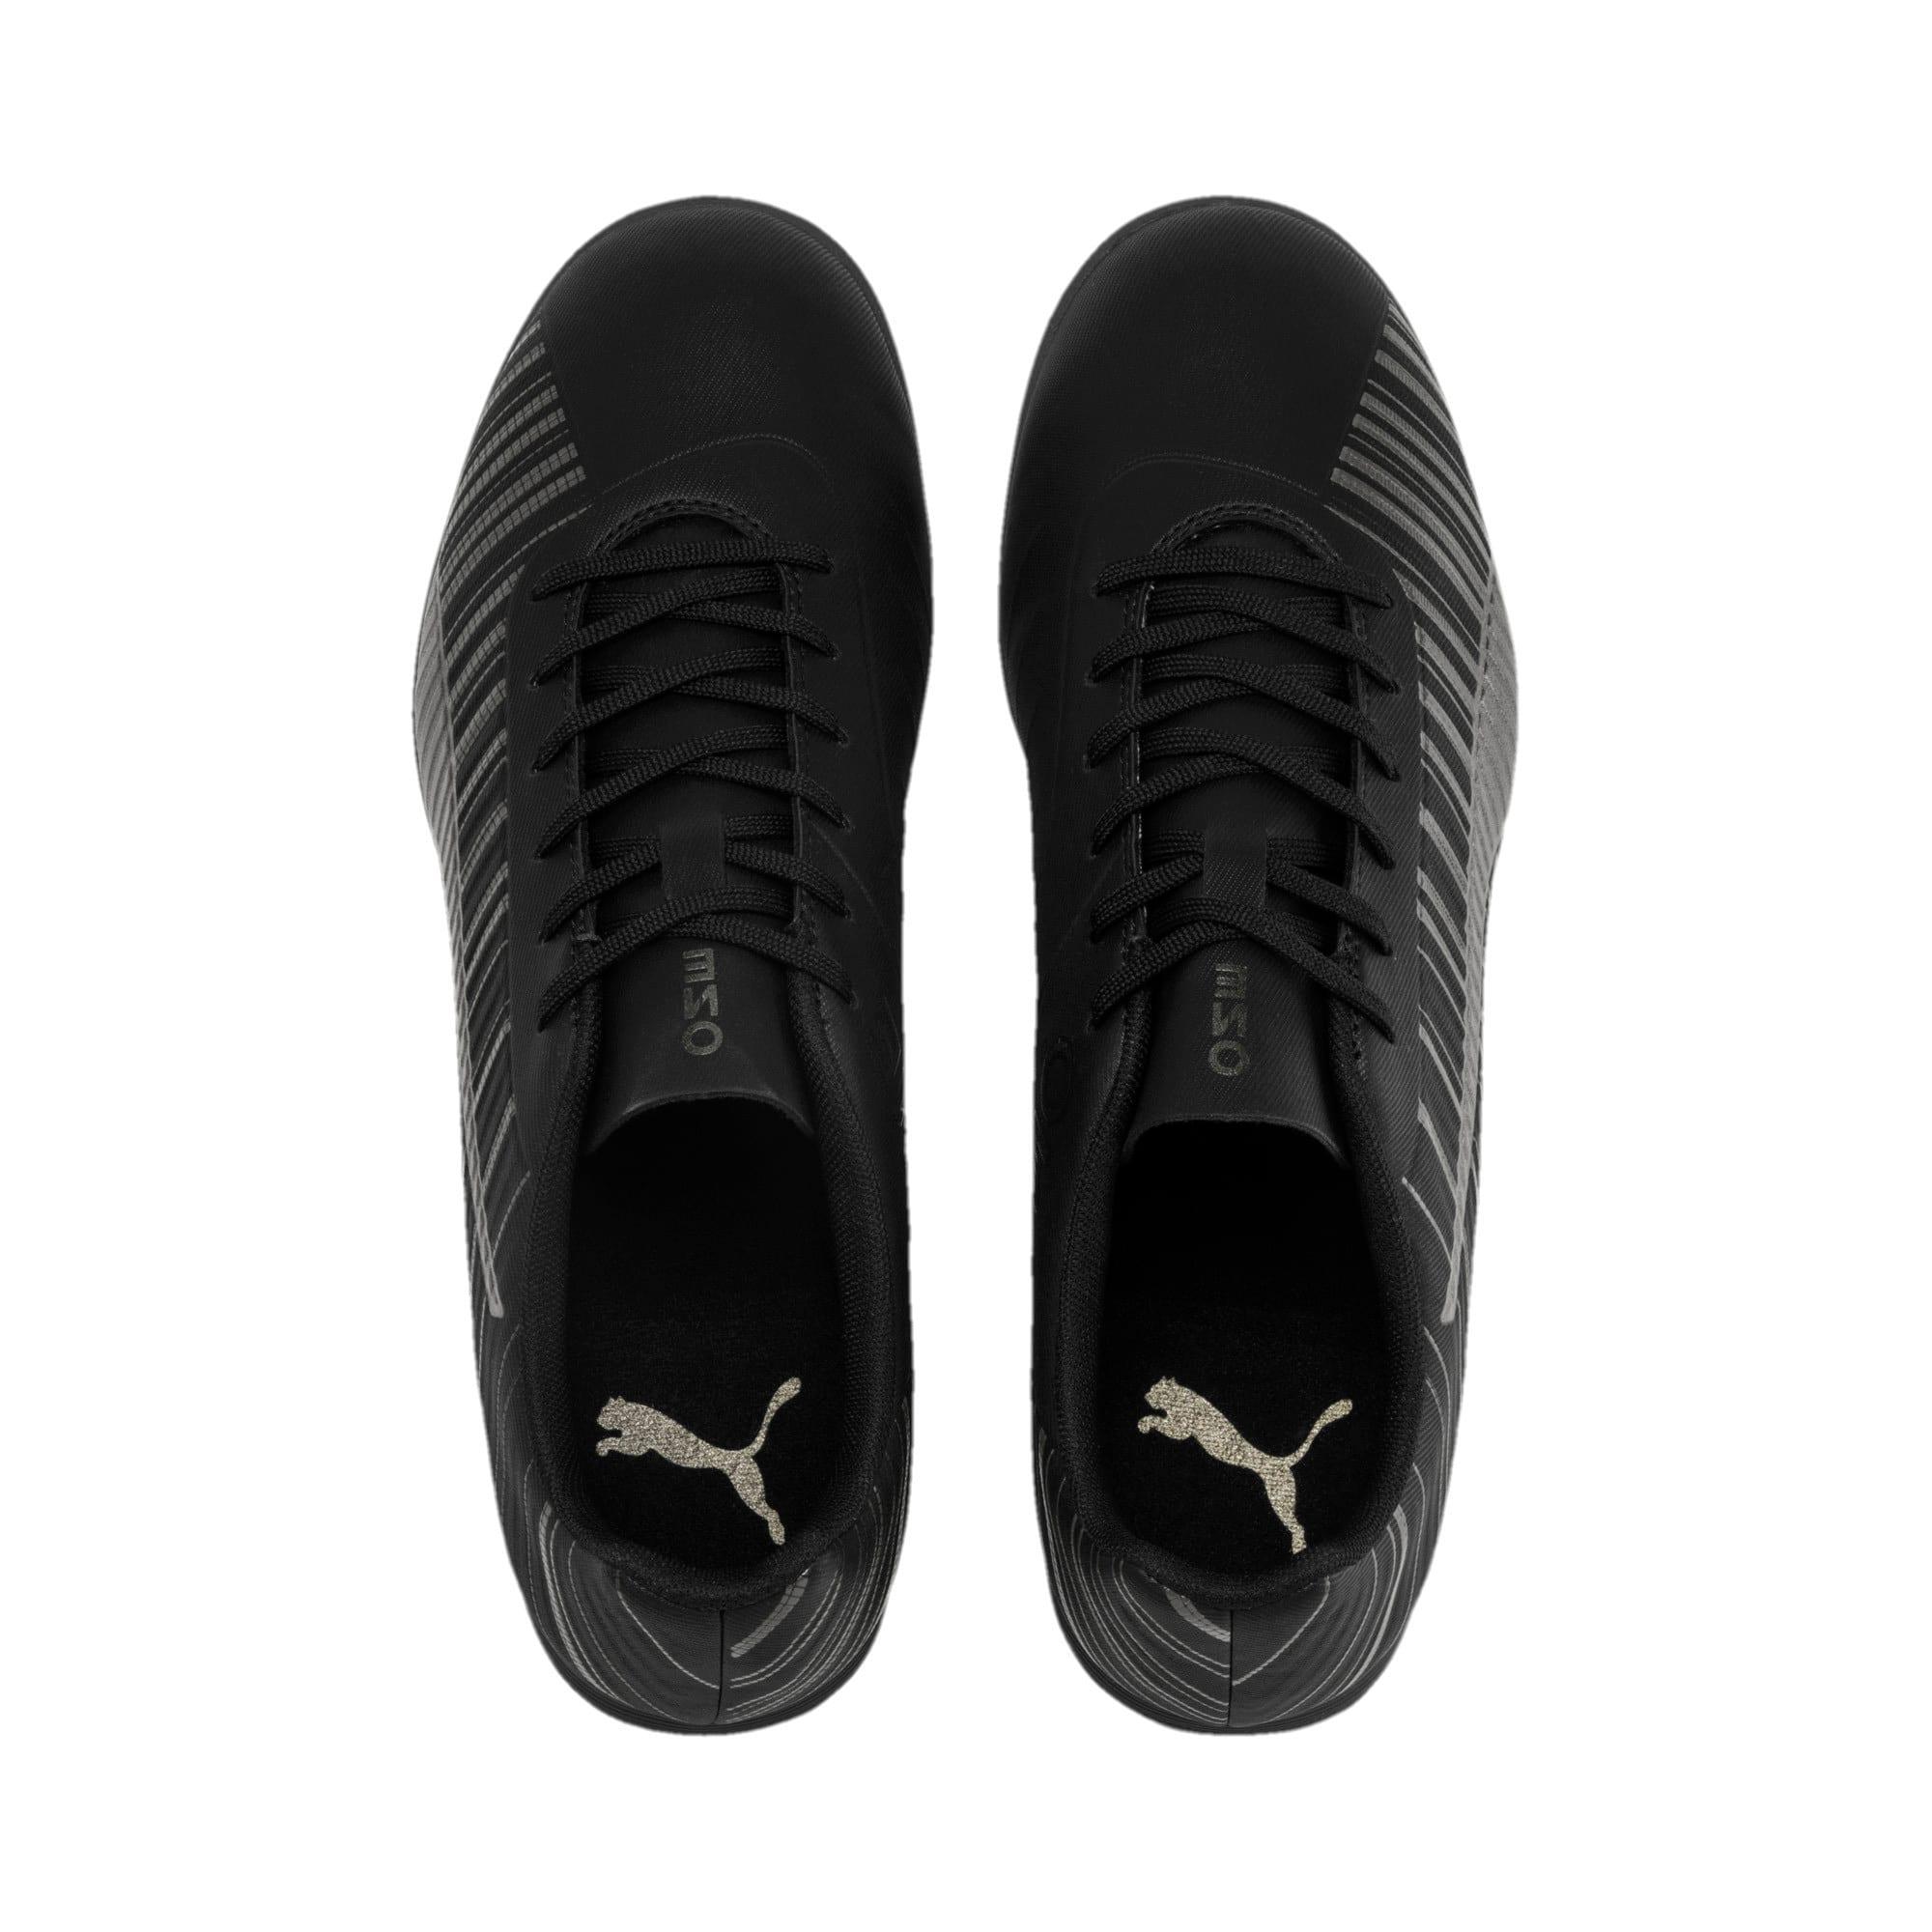 Thumbnail 7 of PUMA ONE 5.4 TT Men's Soccer Shoes, Black-Black-Puma Aged Silver, medium